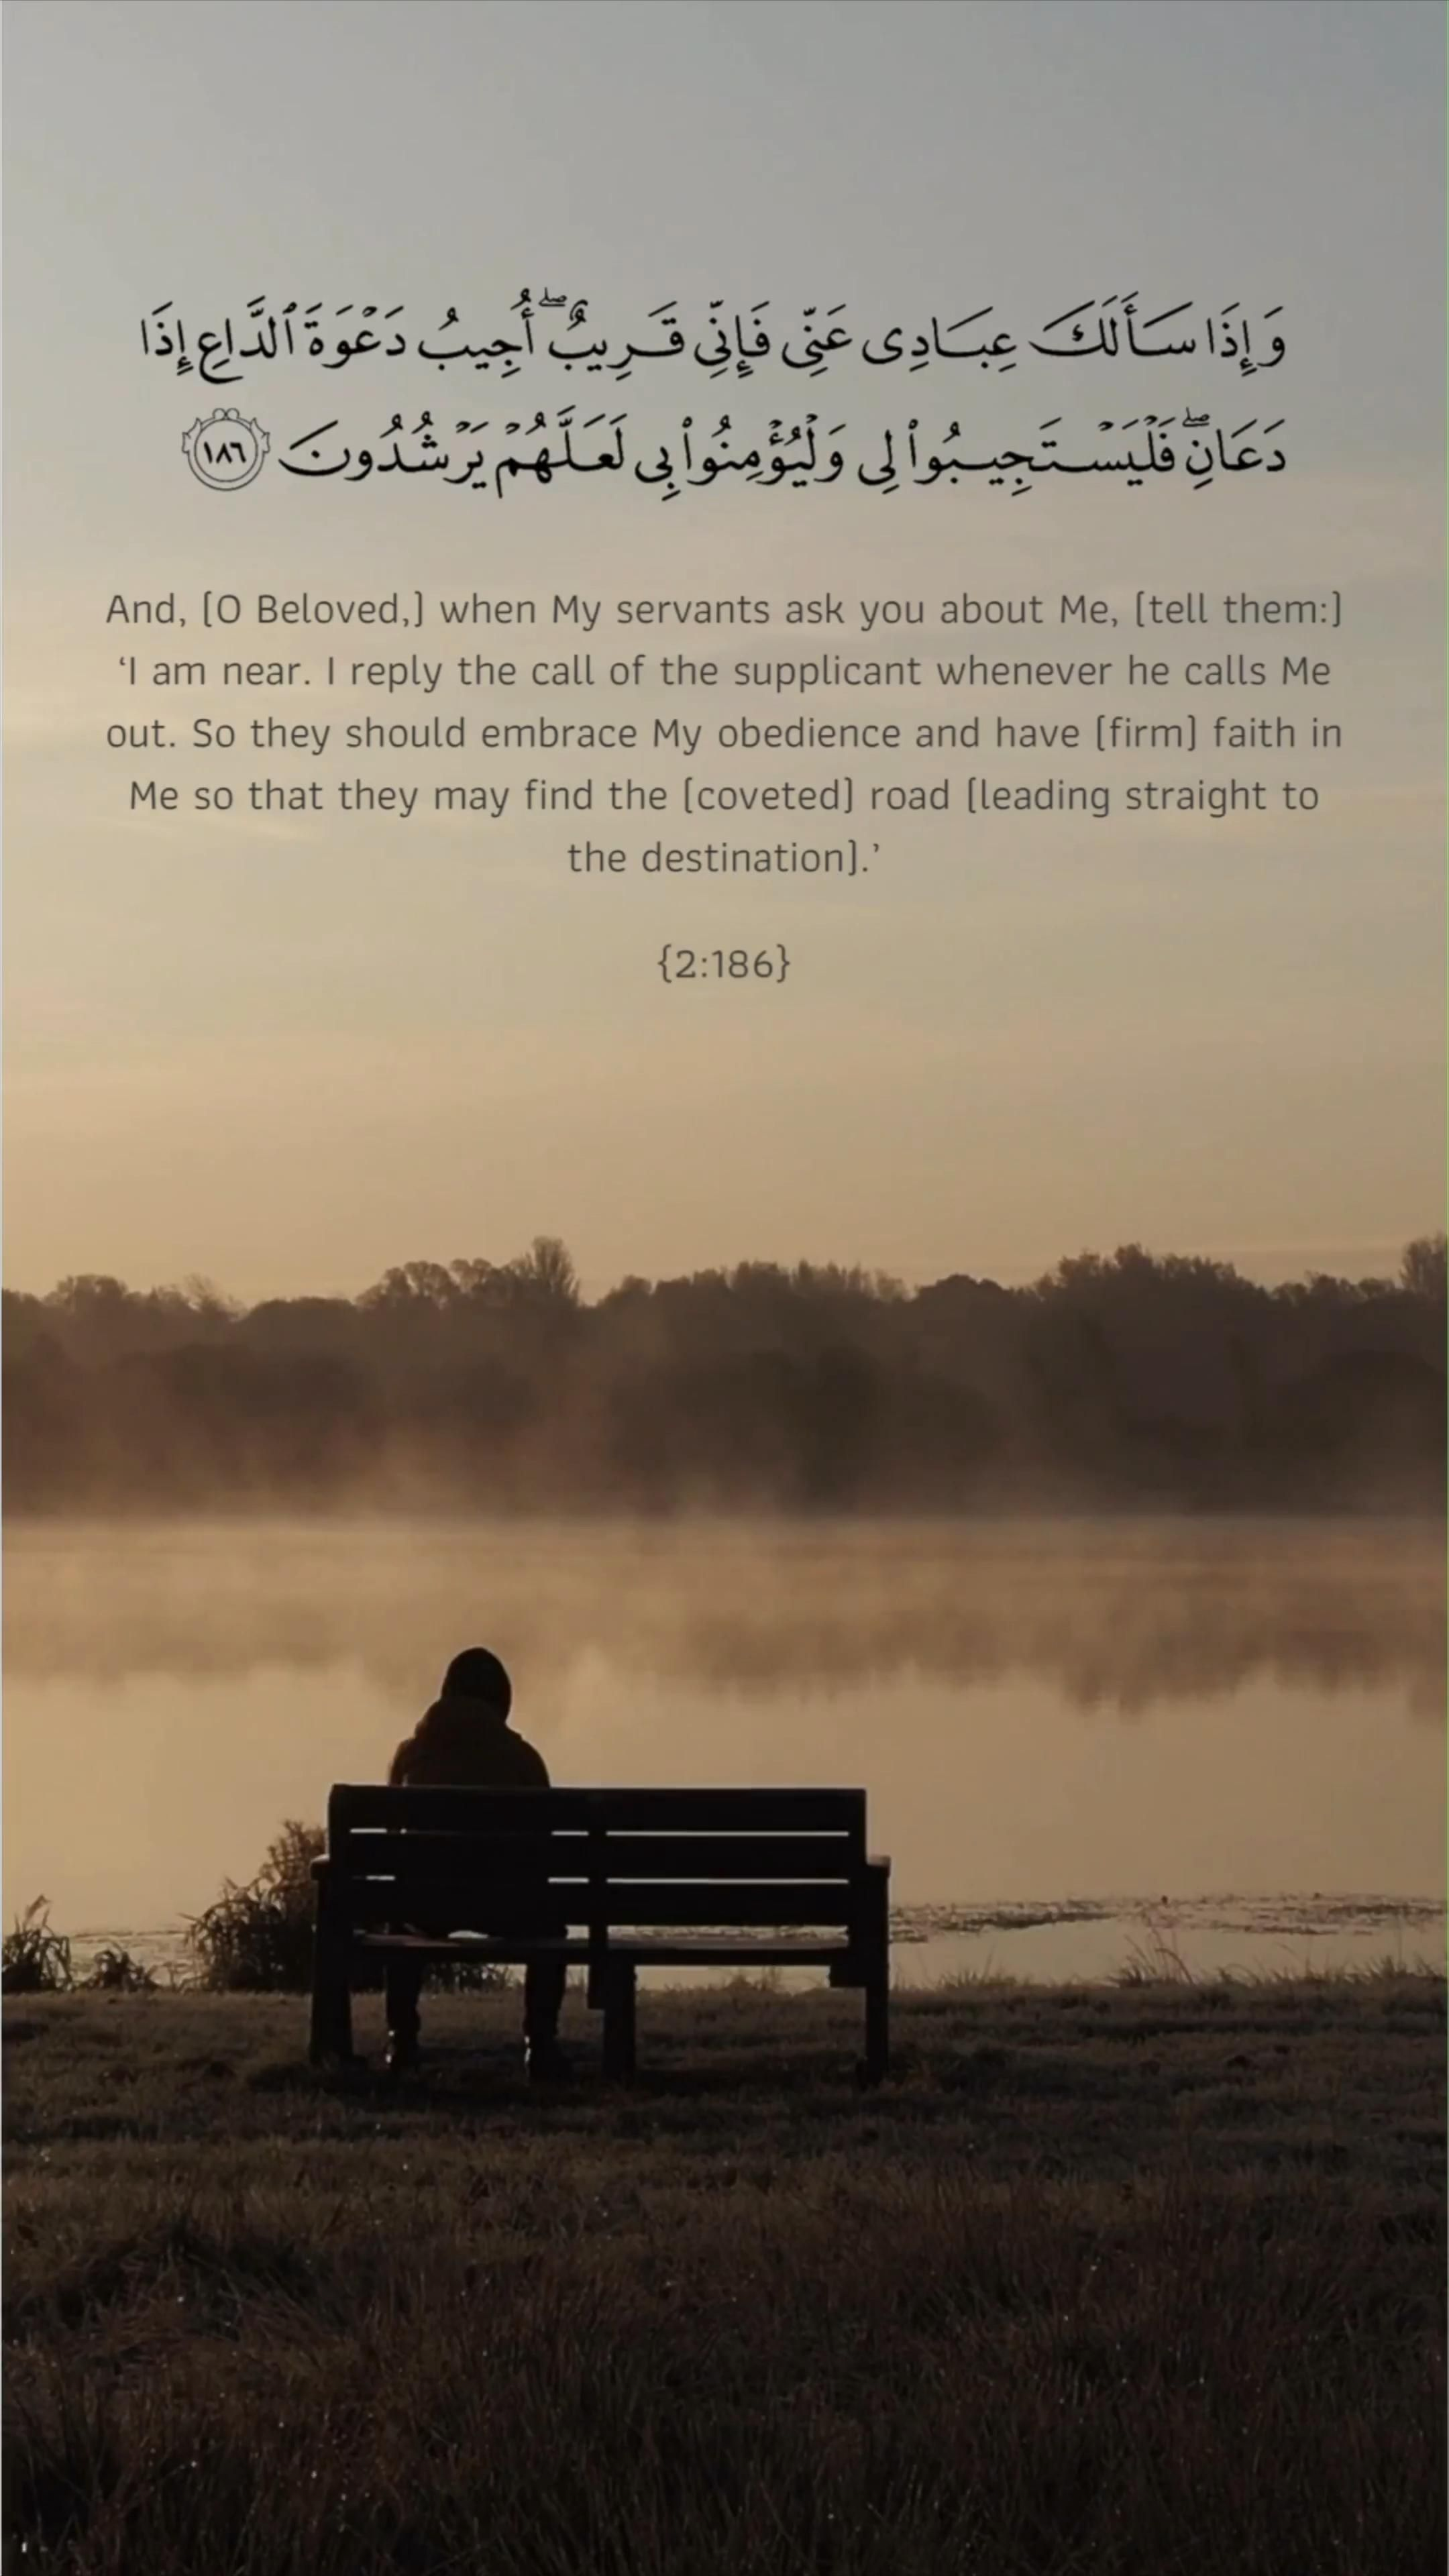 Video Surah Baqarah Verse 186 2 186 Kutipan Agama Ayat Quran Kitab Allah